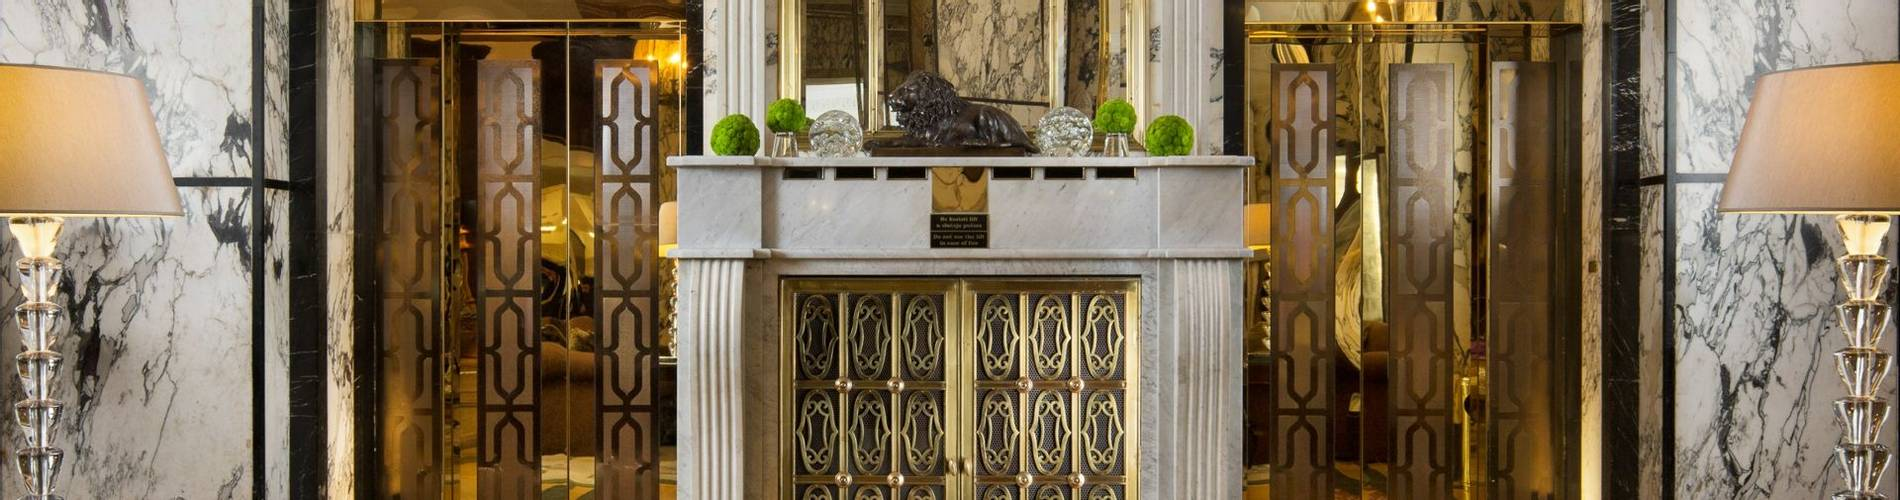 Esplanade Zagreb Hotel - Elevators.jpg